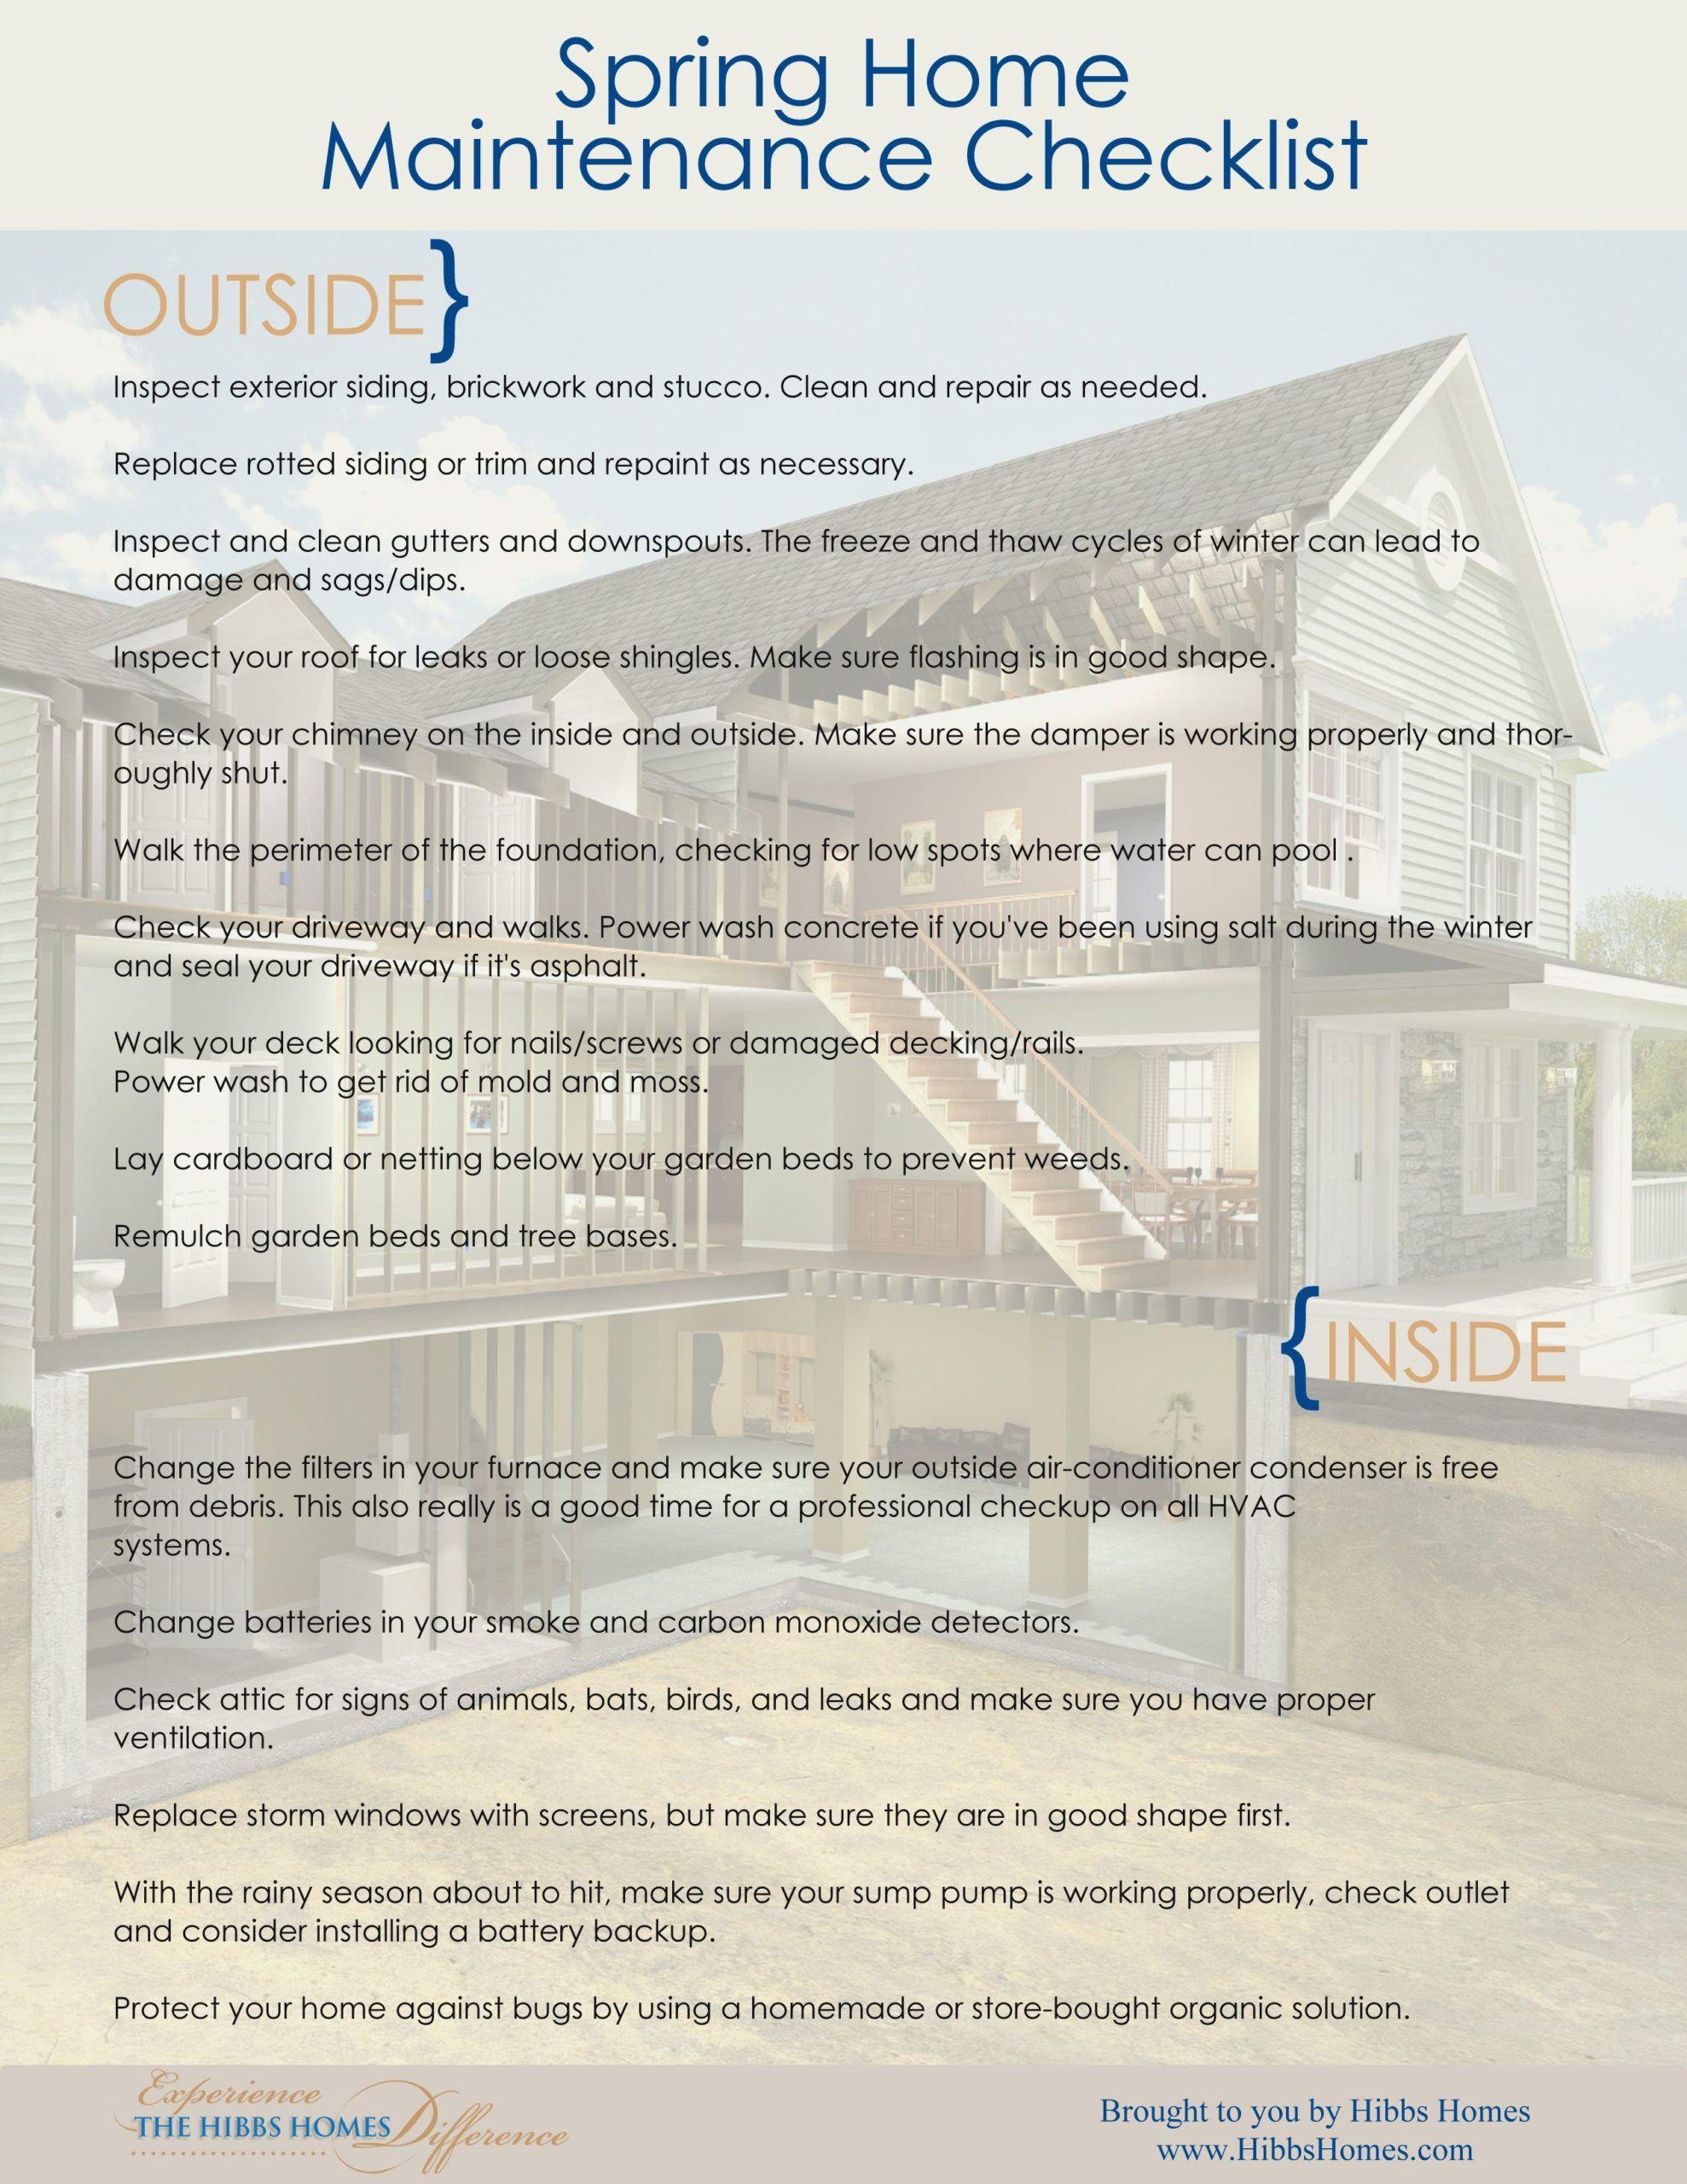 Blog Hibbs Homes Blog Hibbs Homes In 2020 Checkliste St